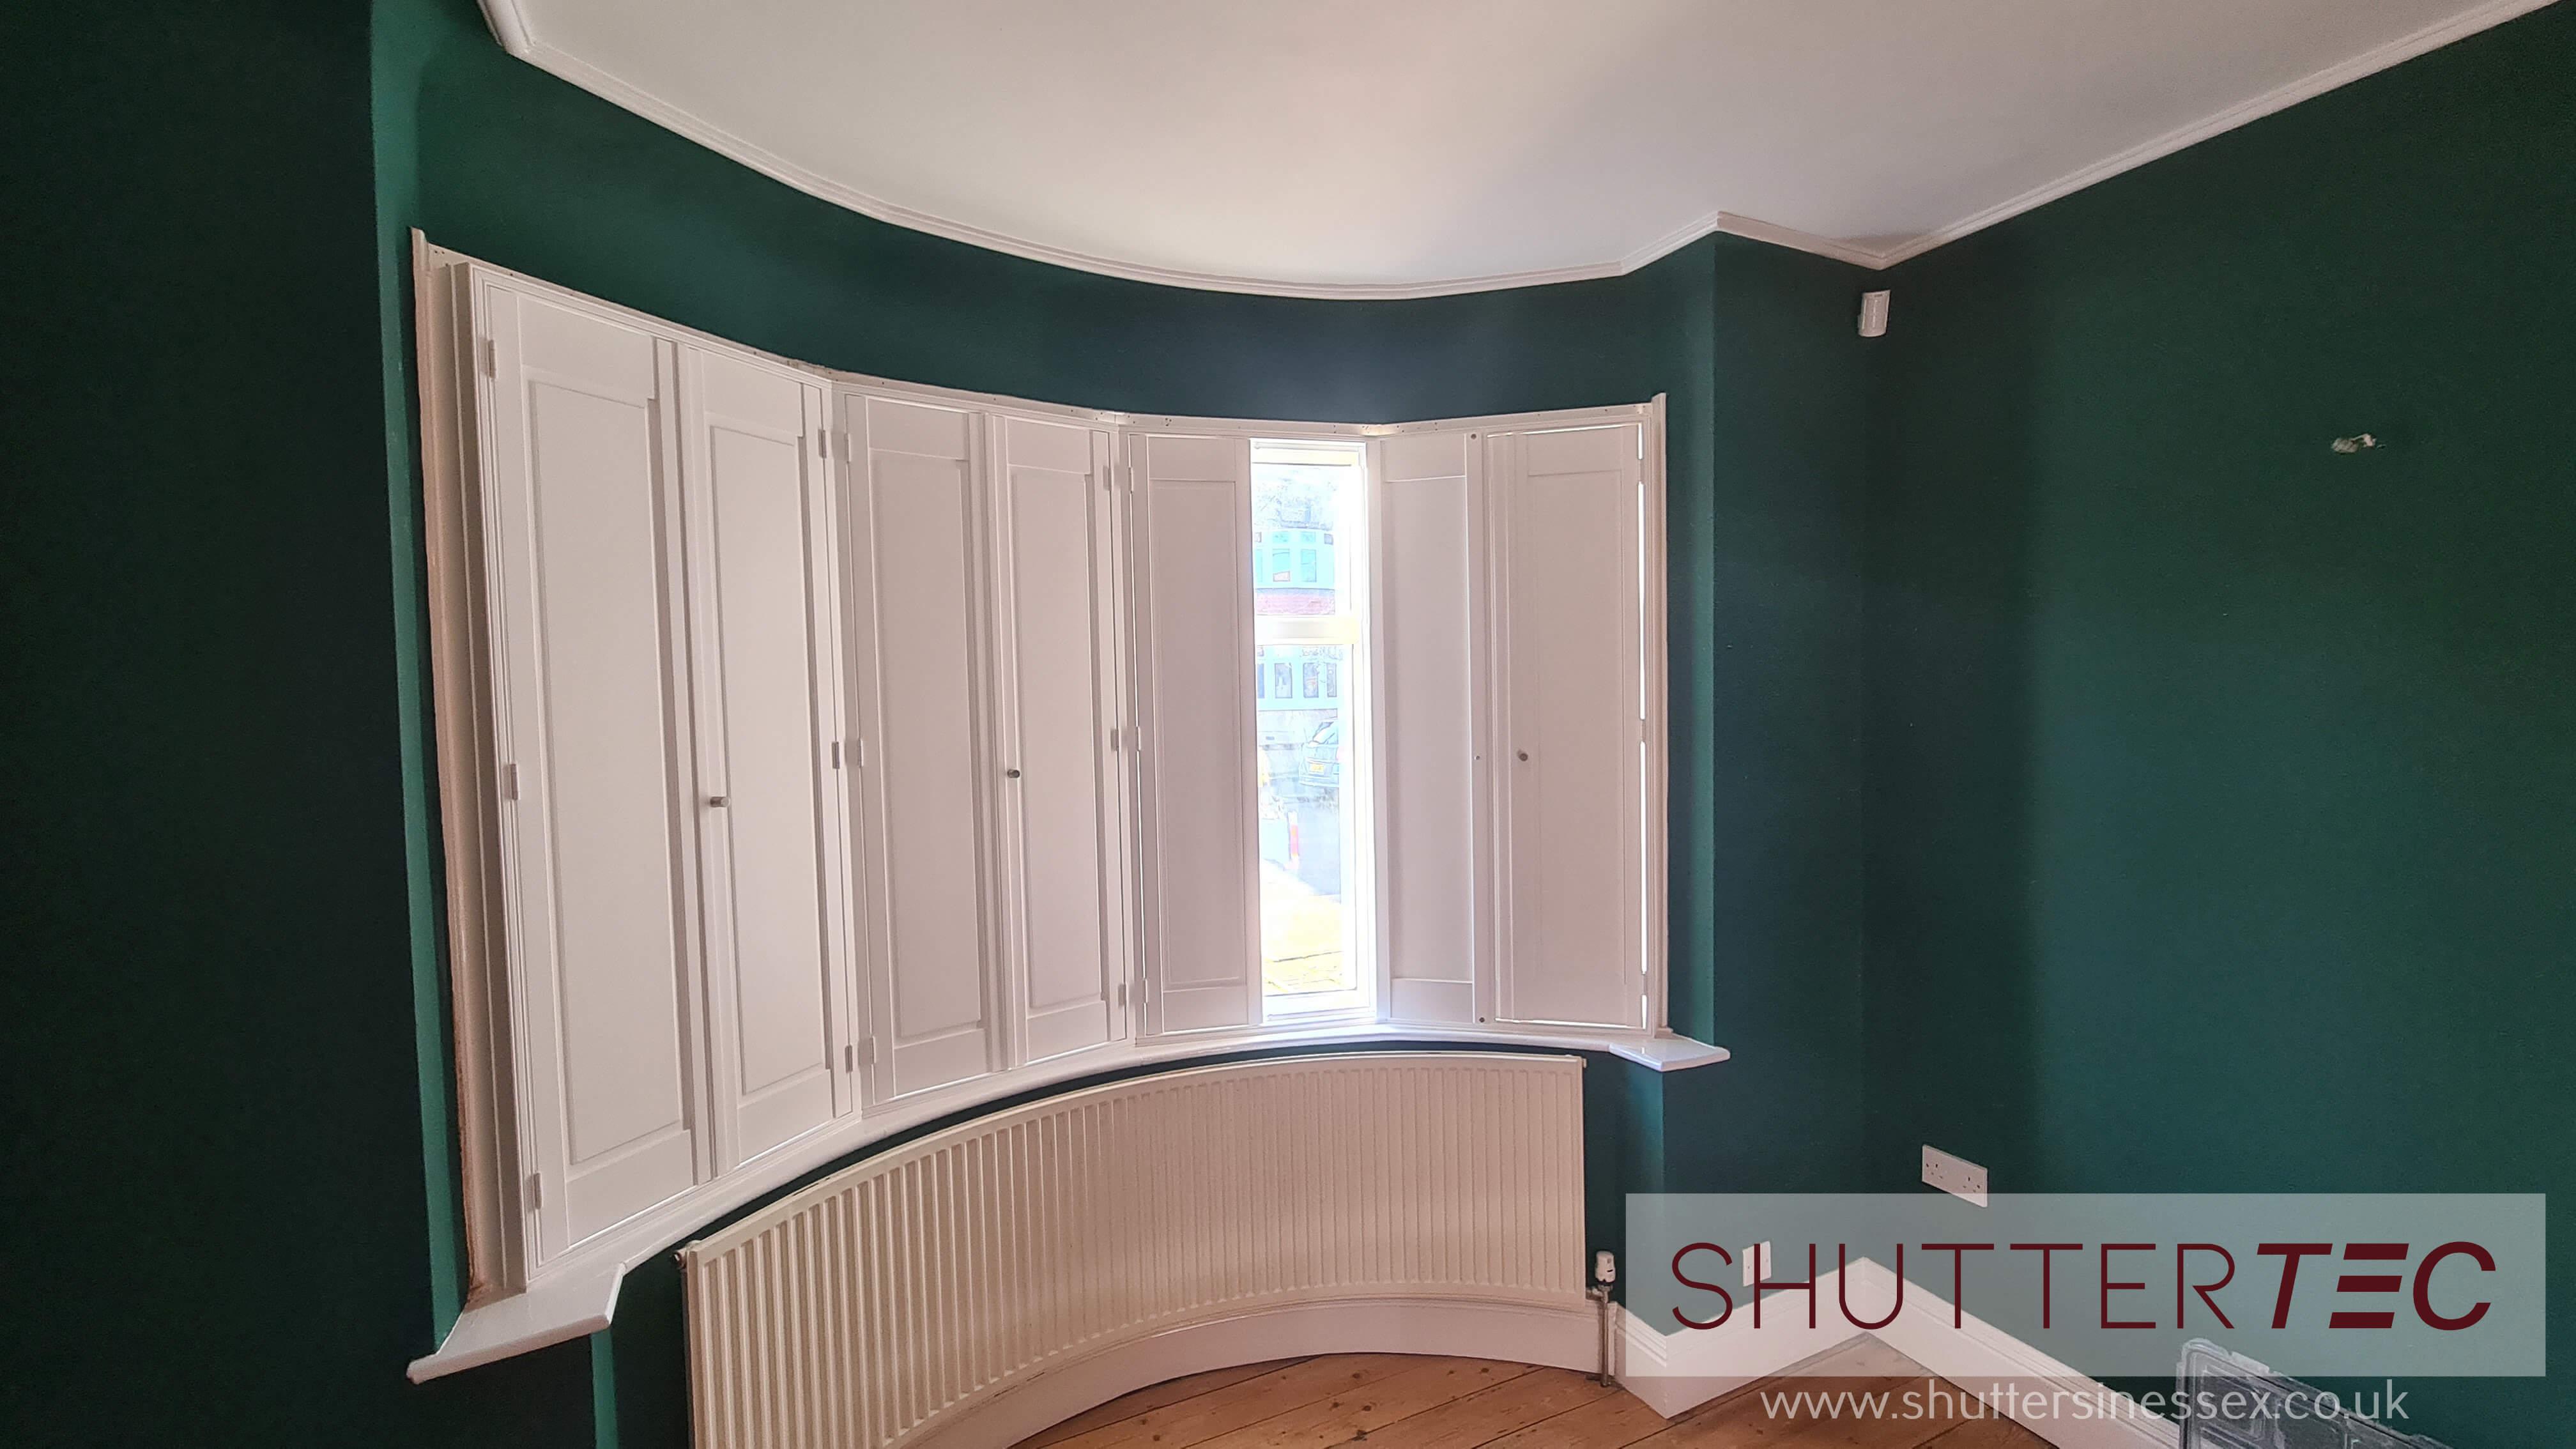 Solid panel shutter for bedroom window